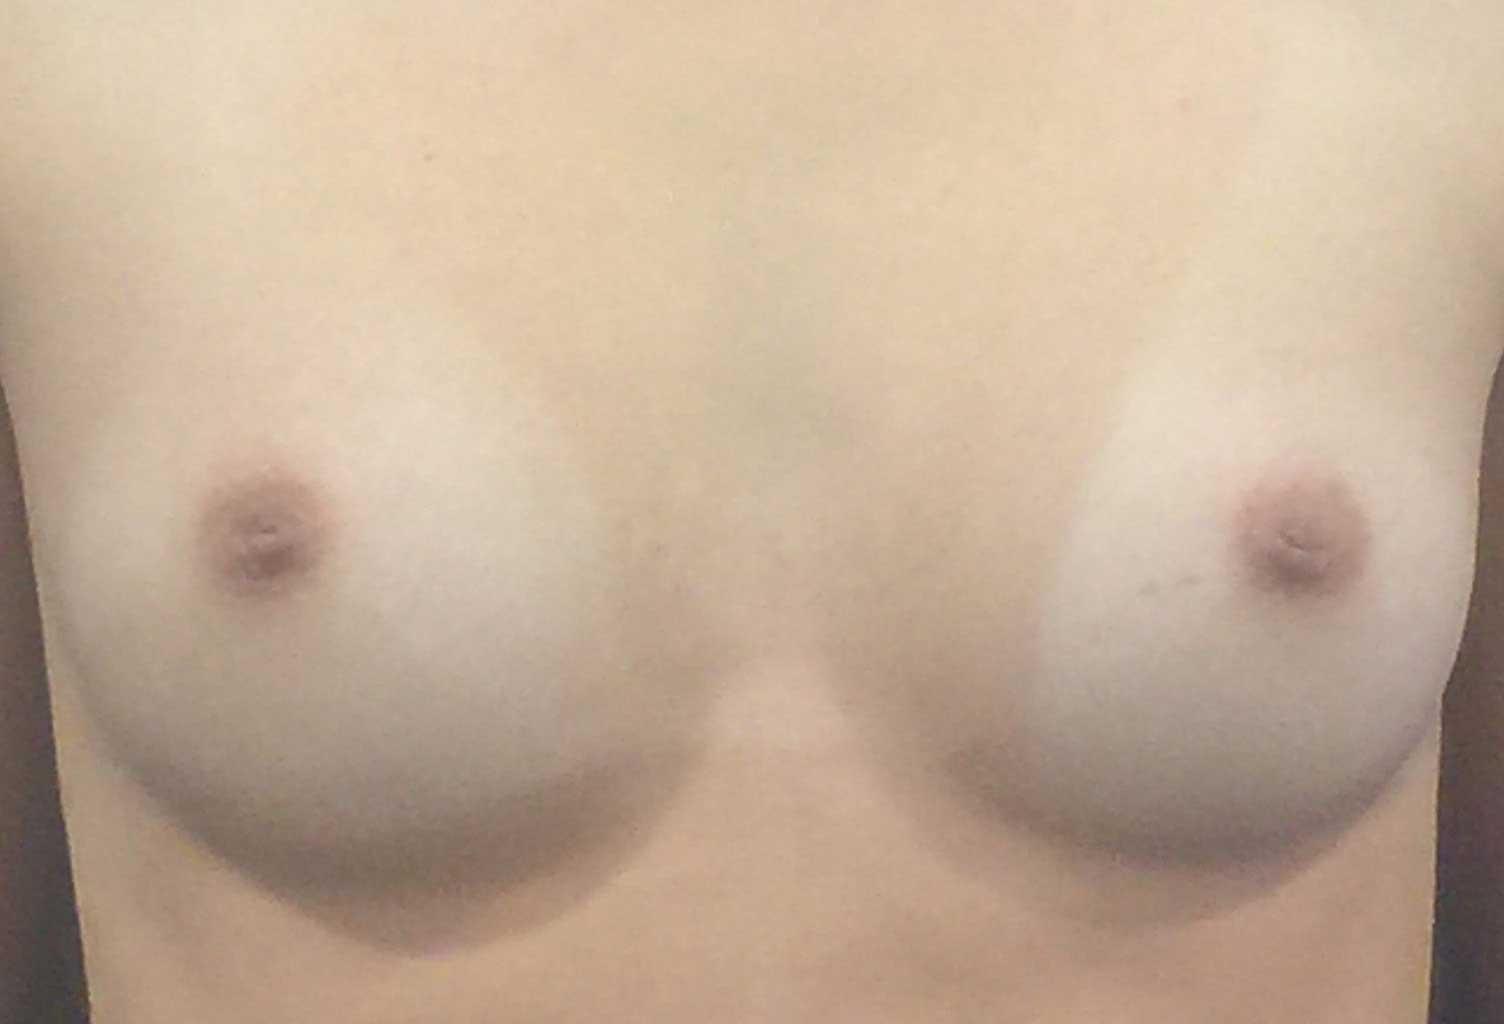 breastaugfront.jpg